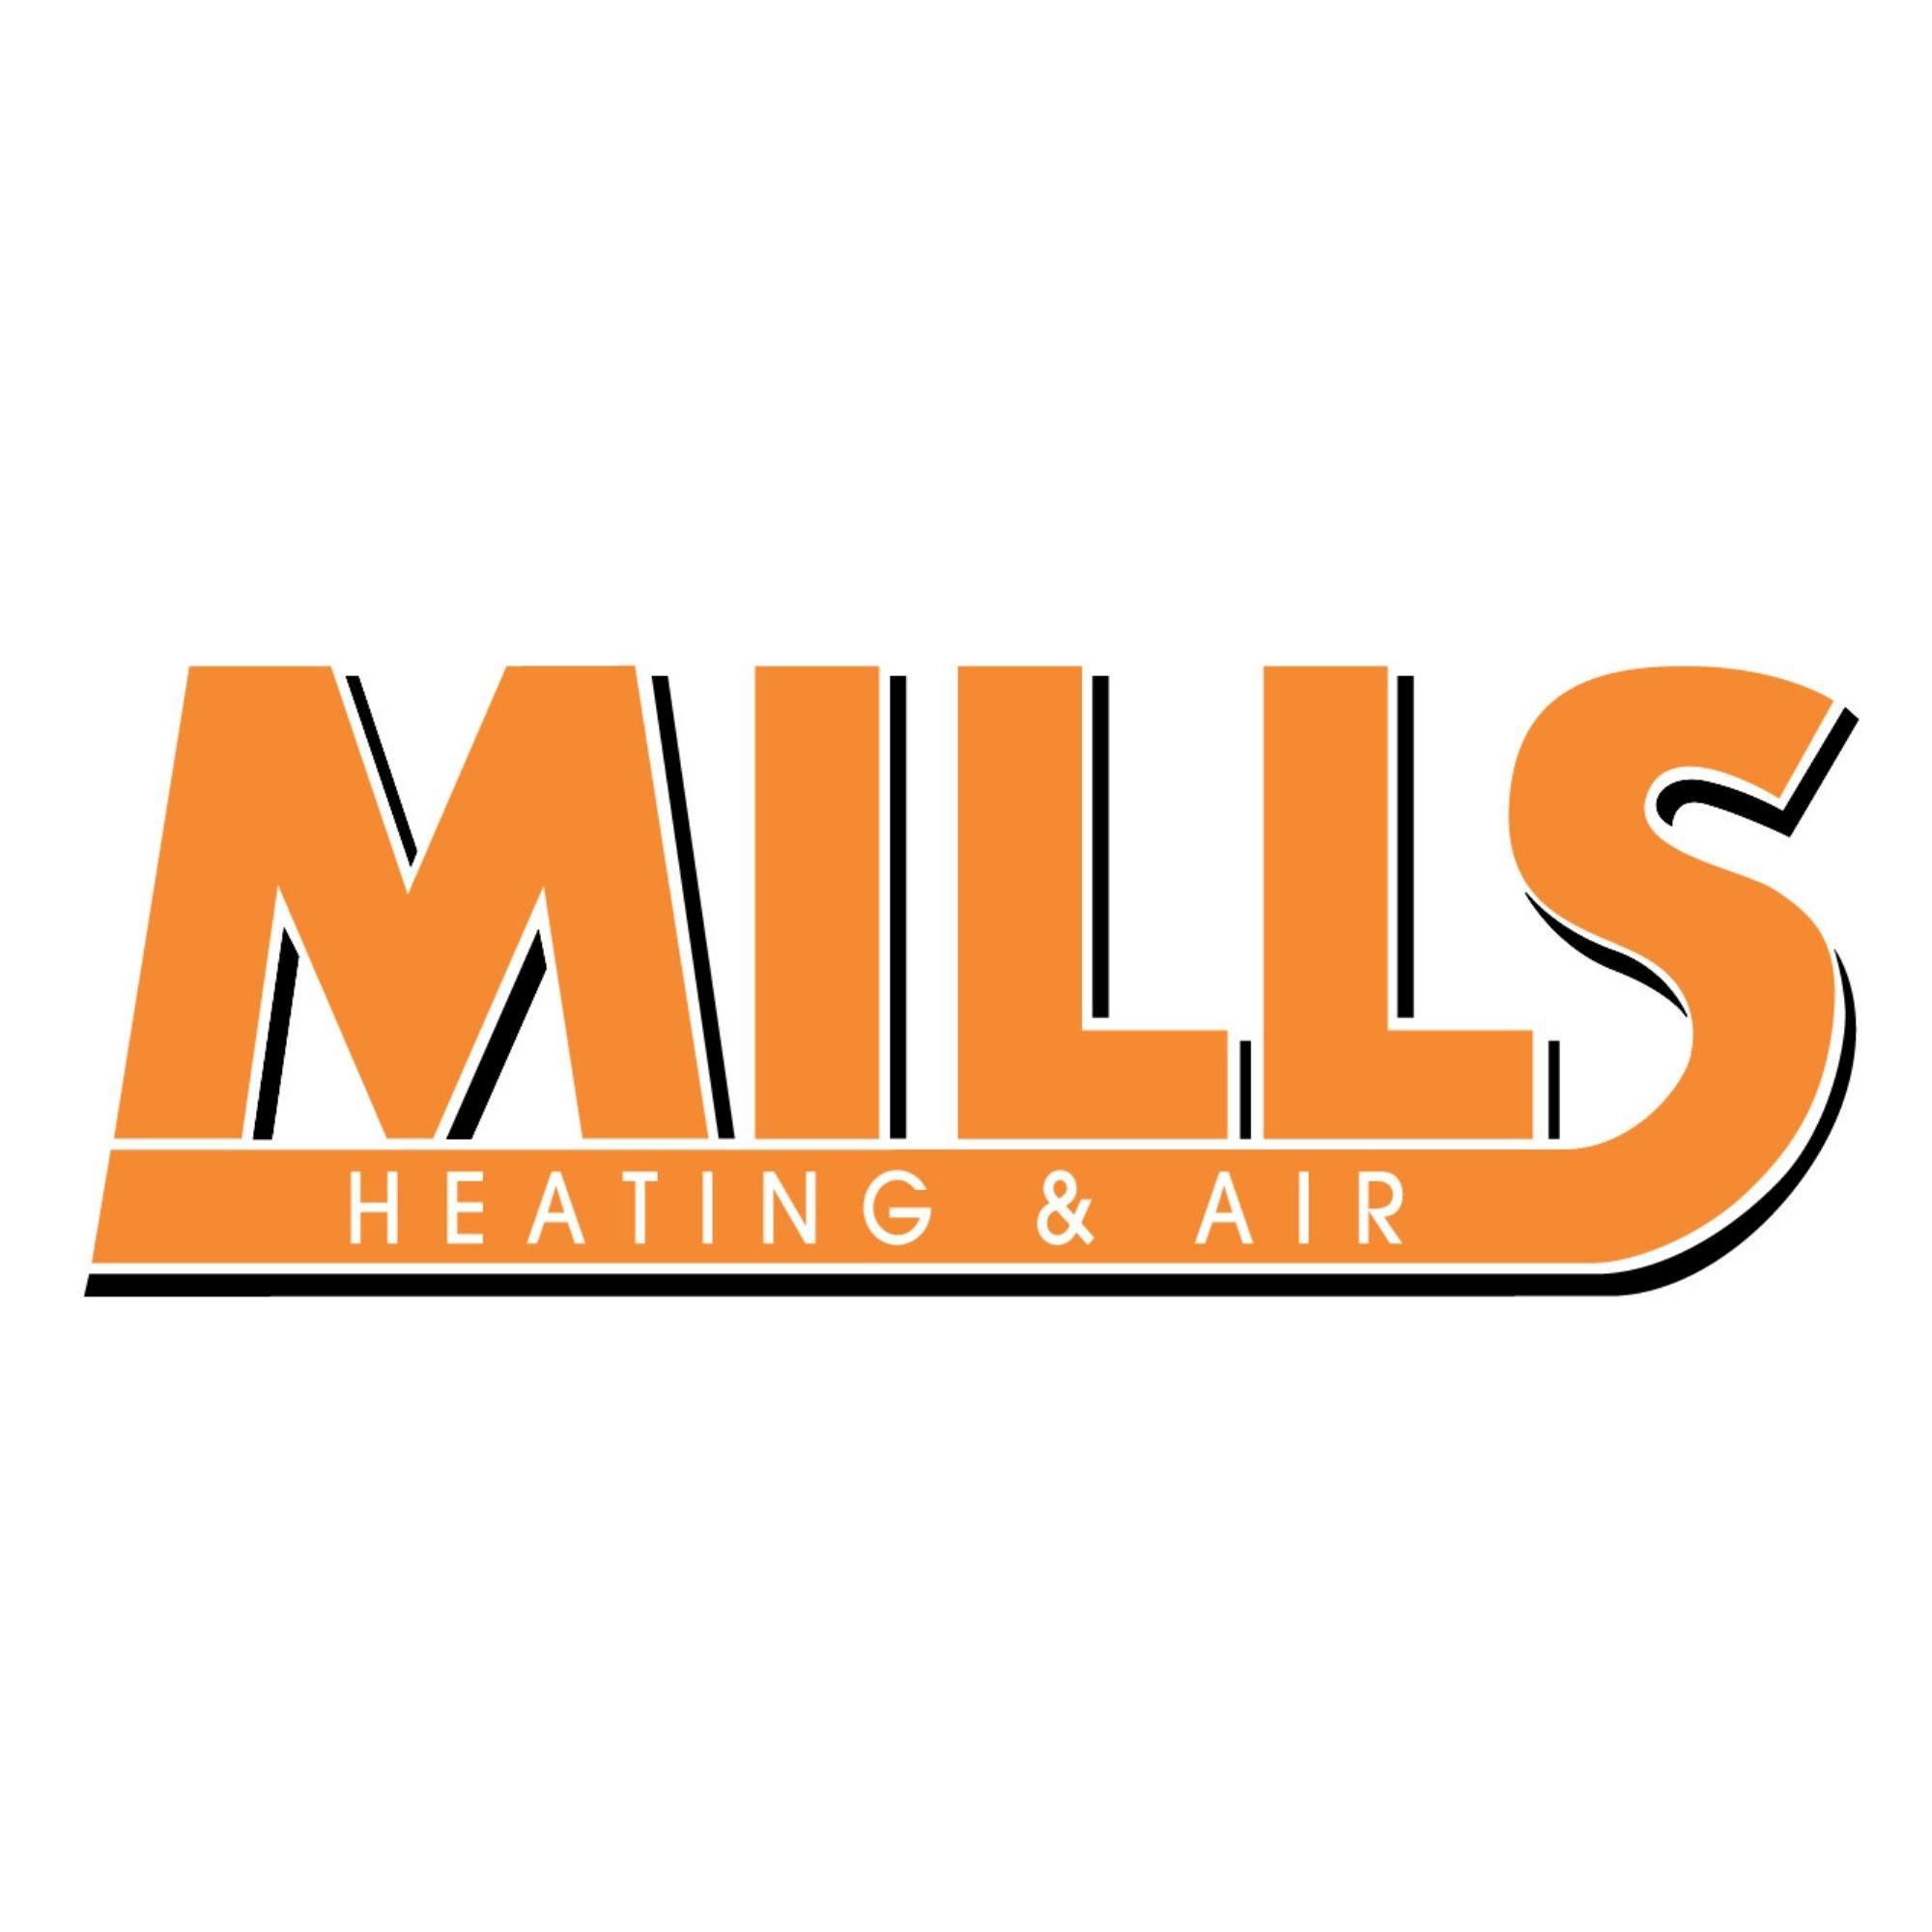 Mills Heating & Air